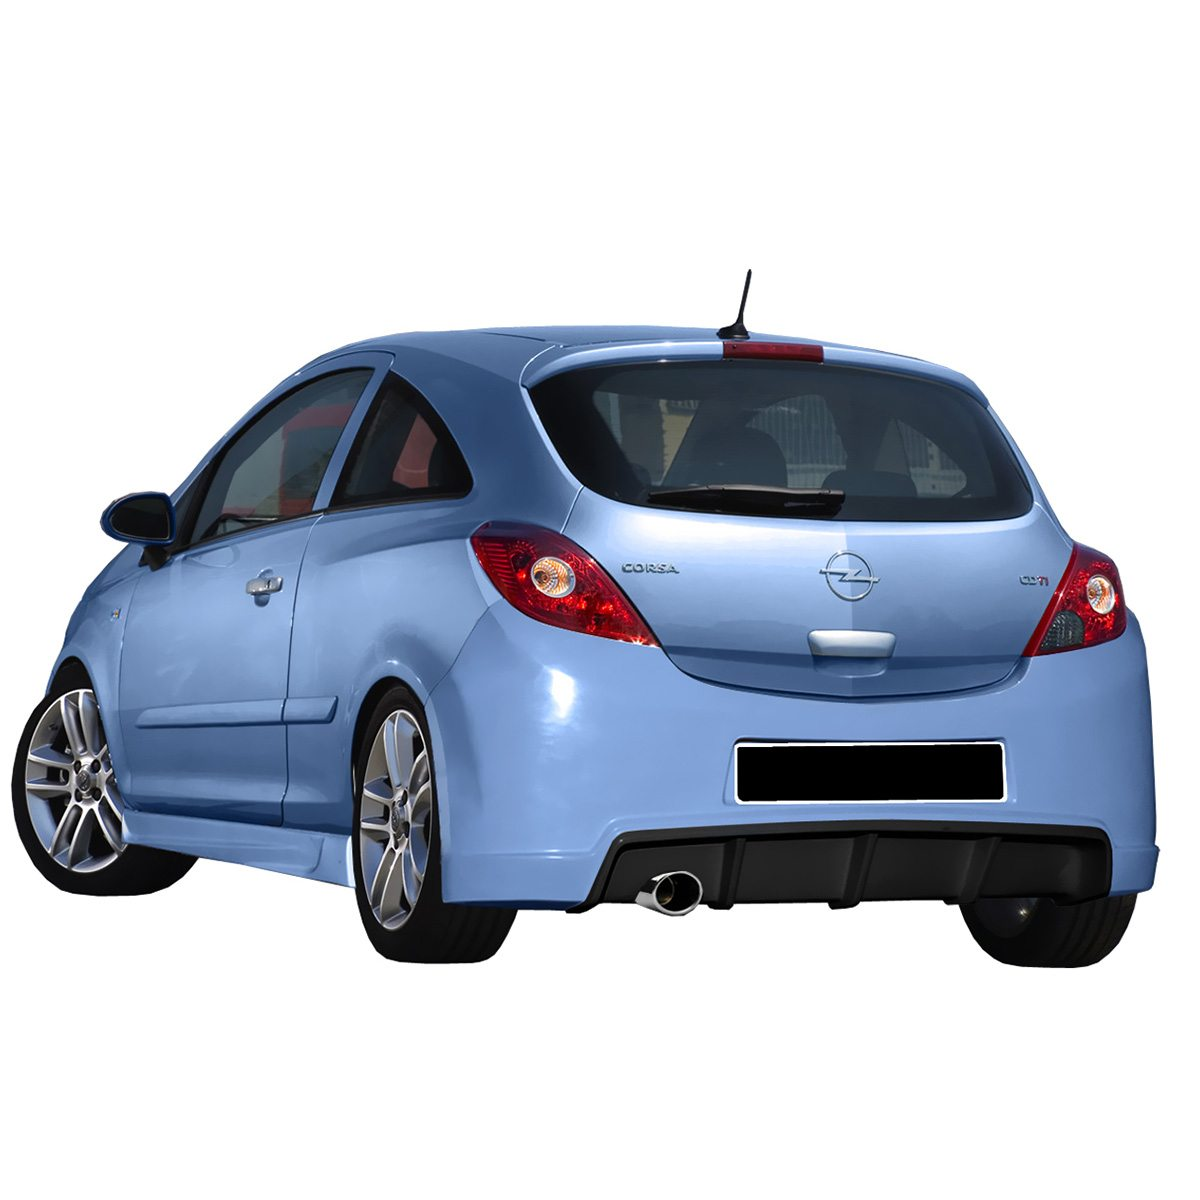 Opel-Corsa-D-Sport-EBF006